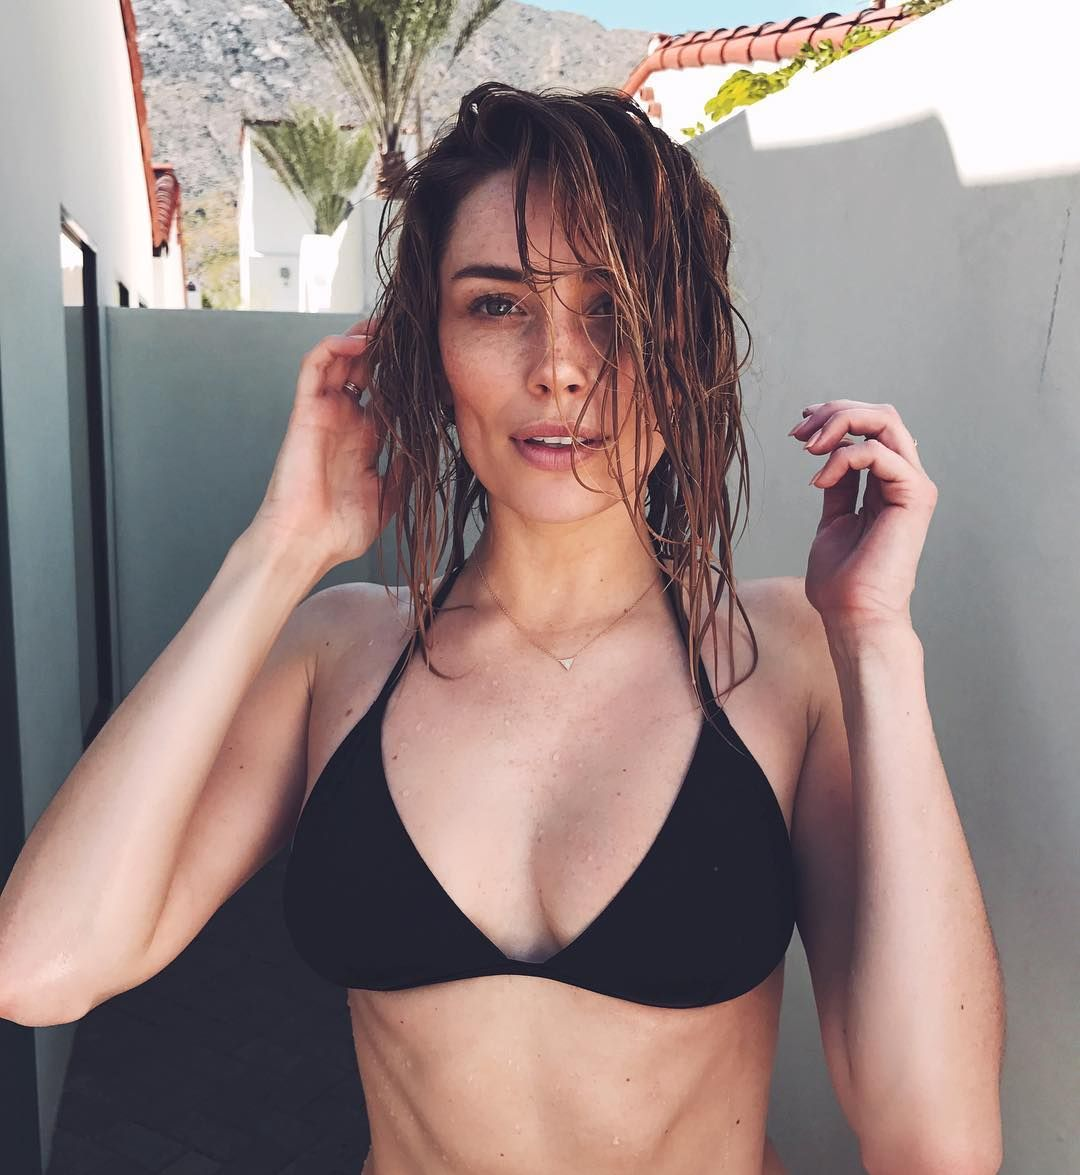 nude Bikini Arielle Vandenberg (33 images) Leaked, Facebook, see through